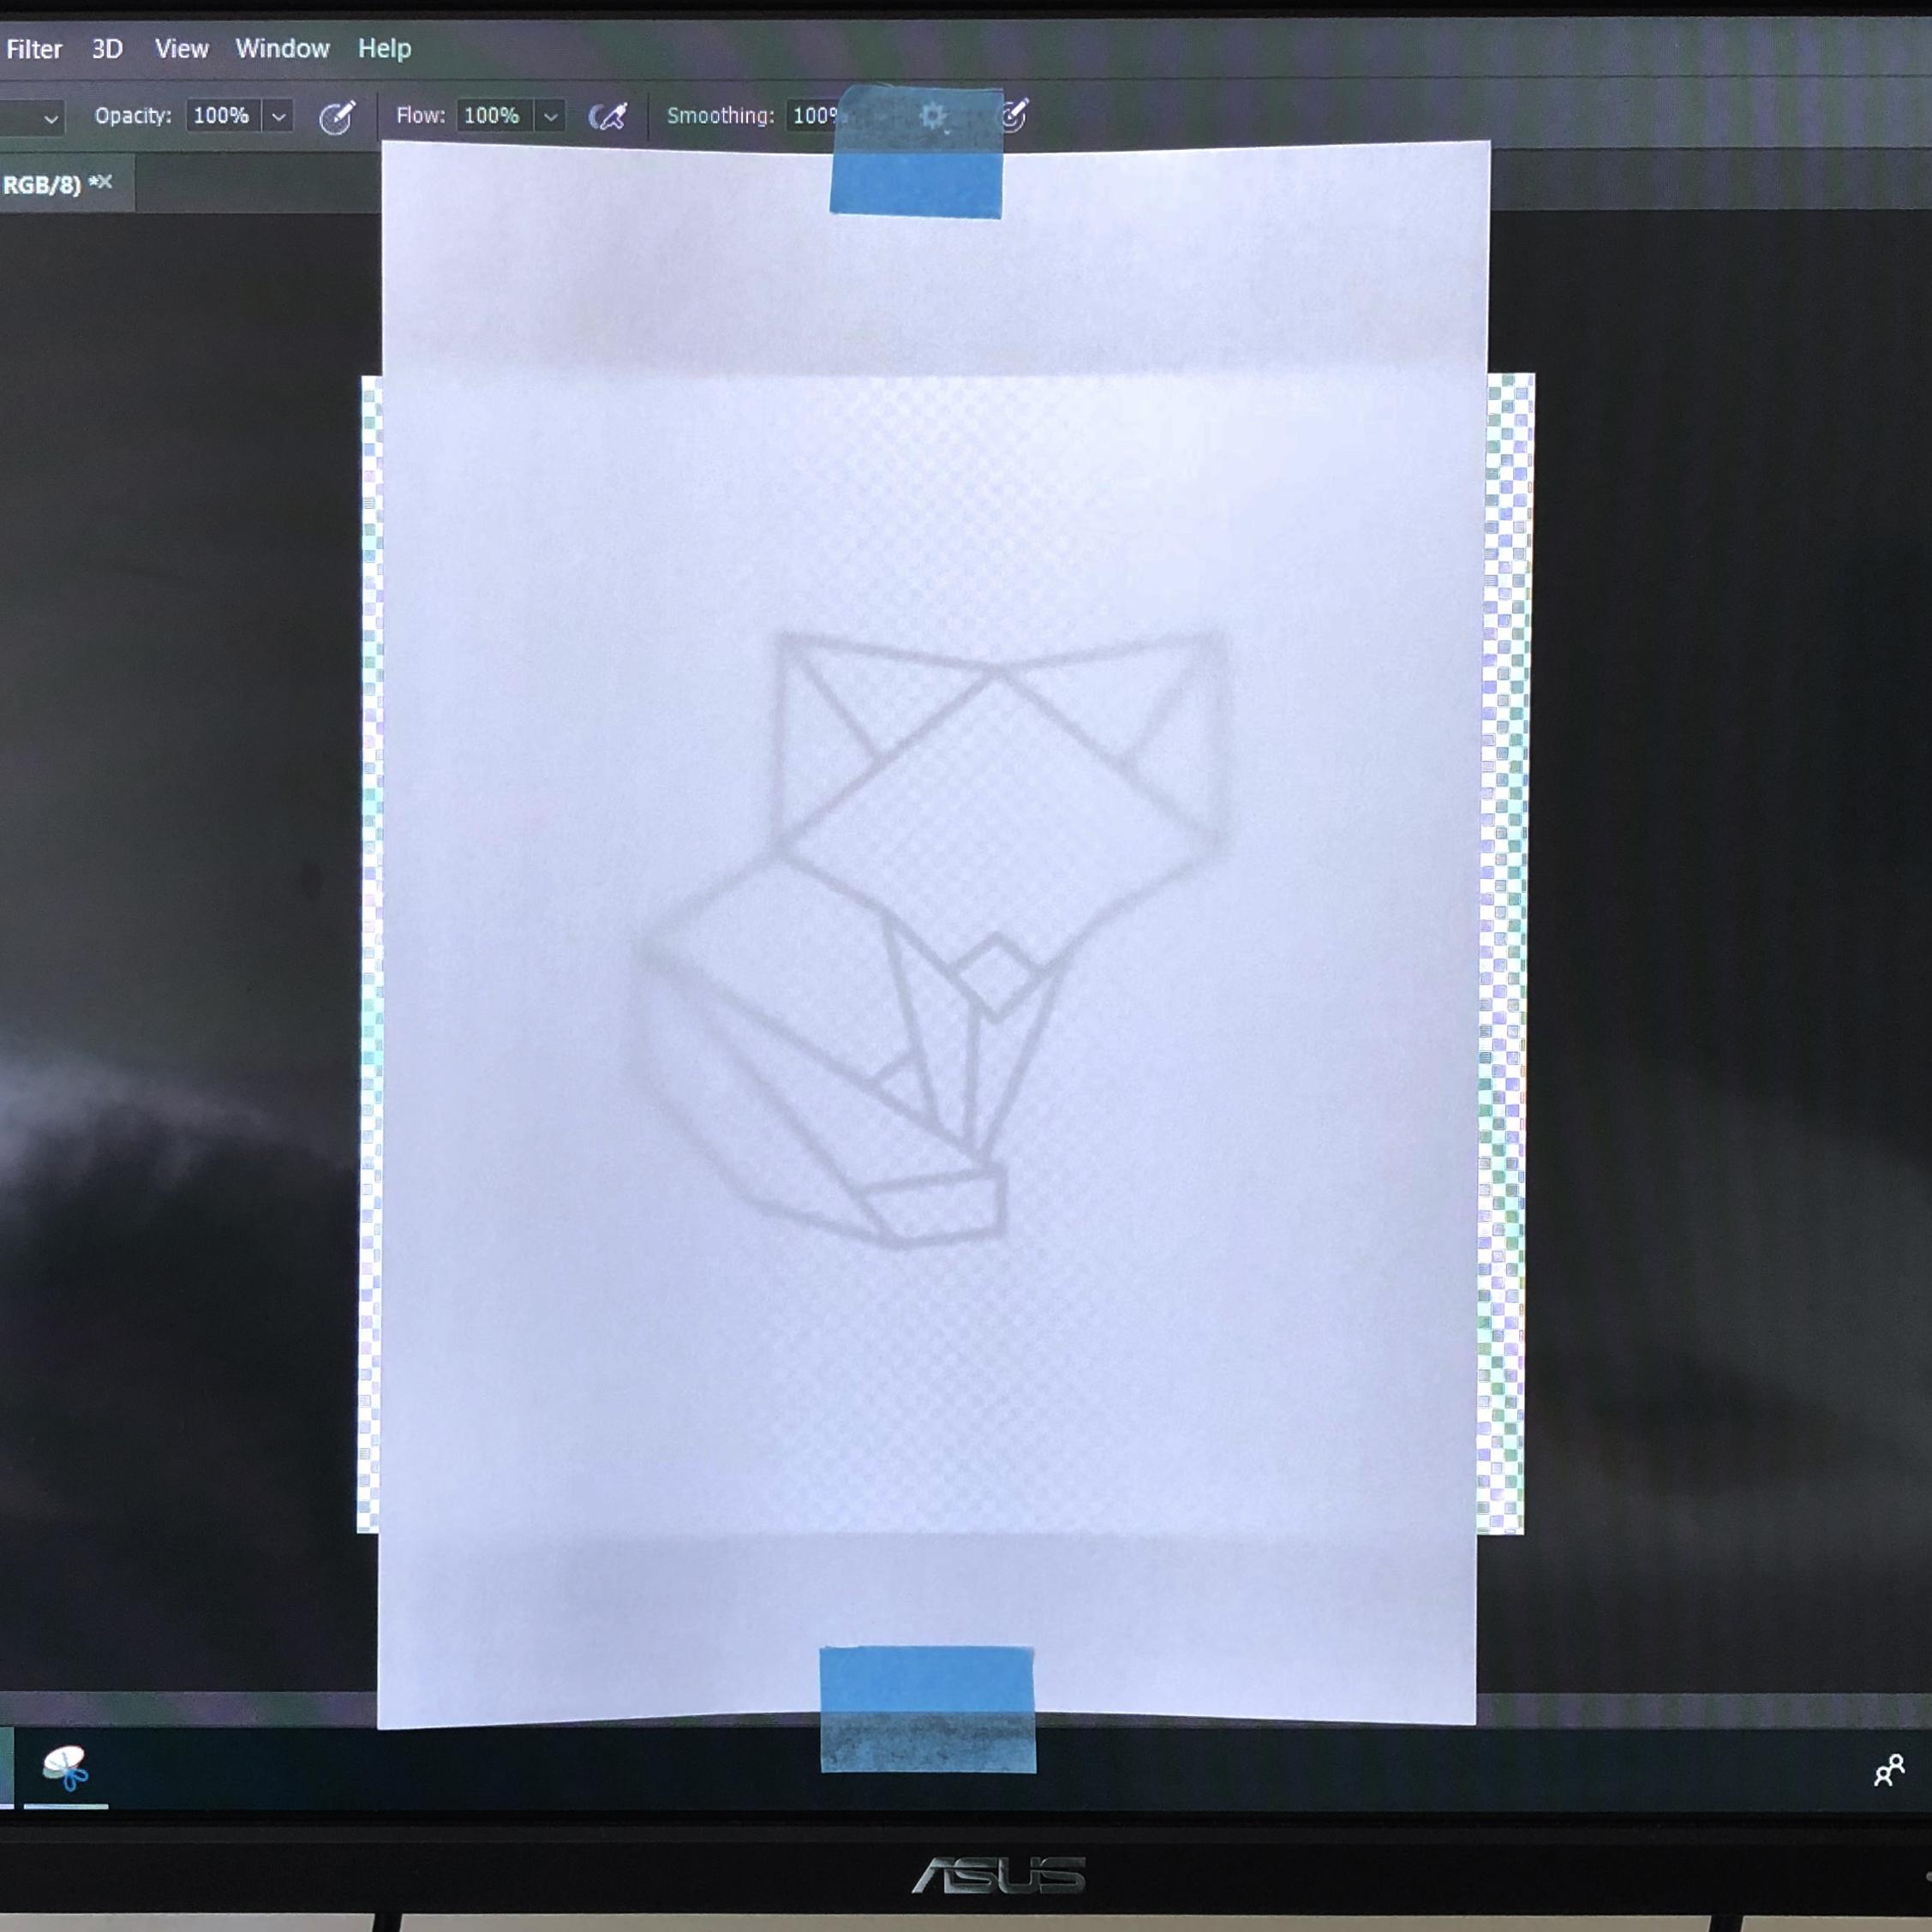 Fox over computer